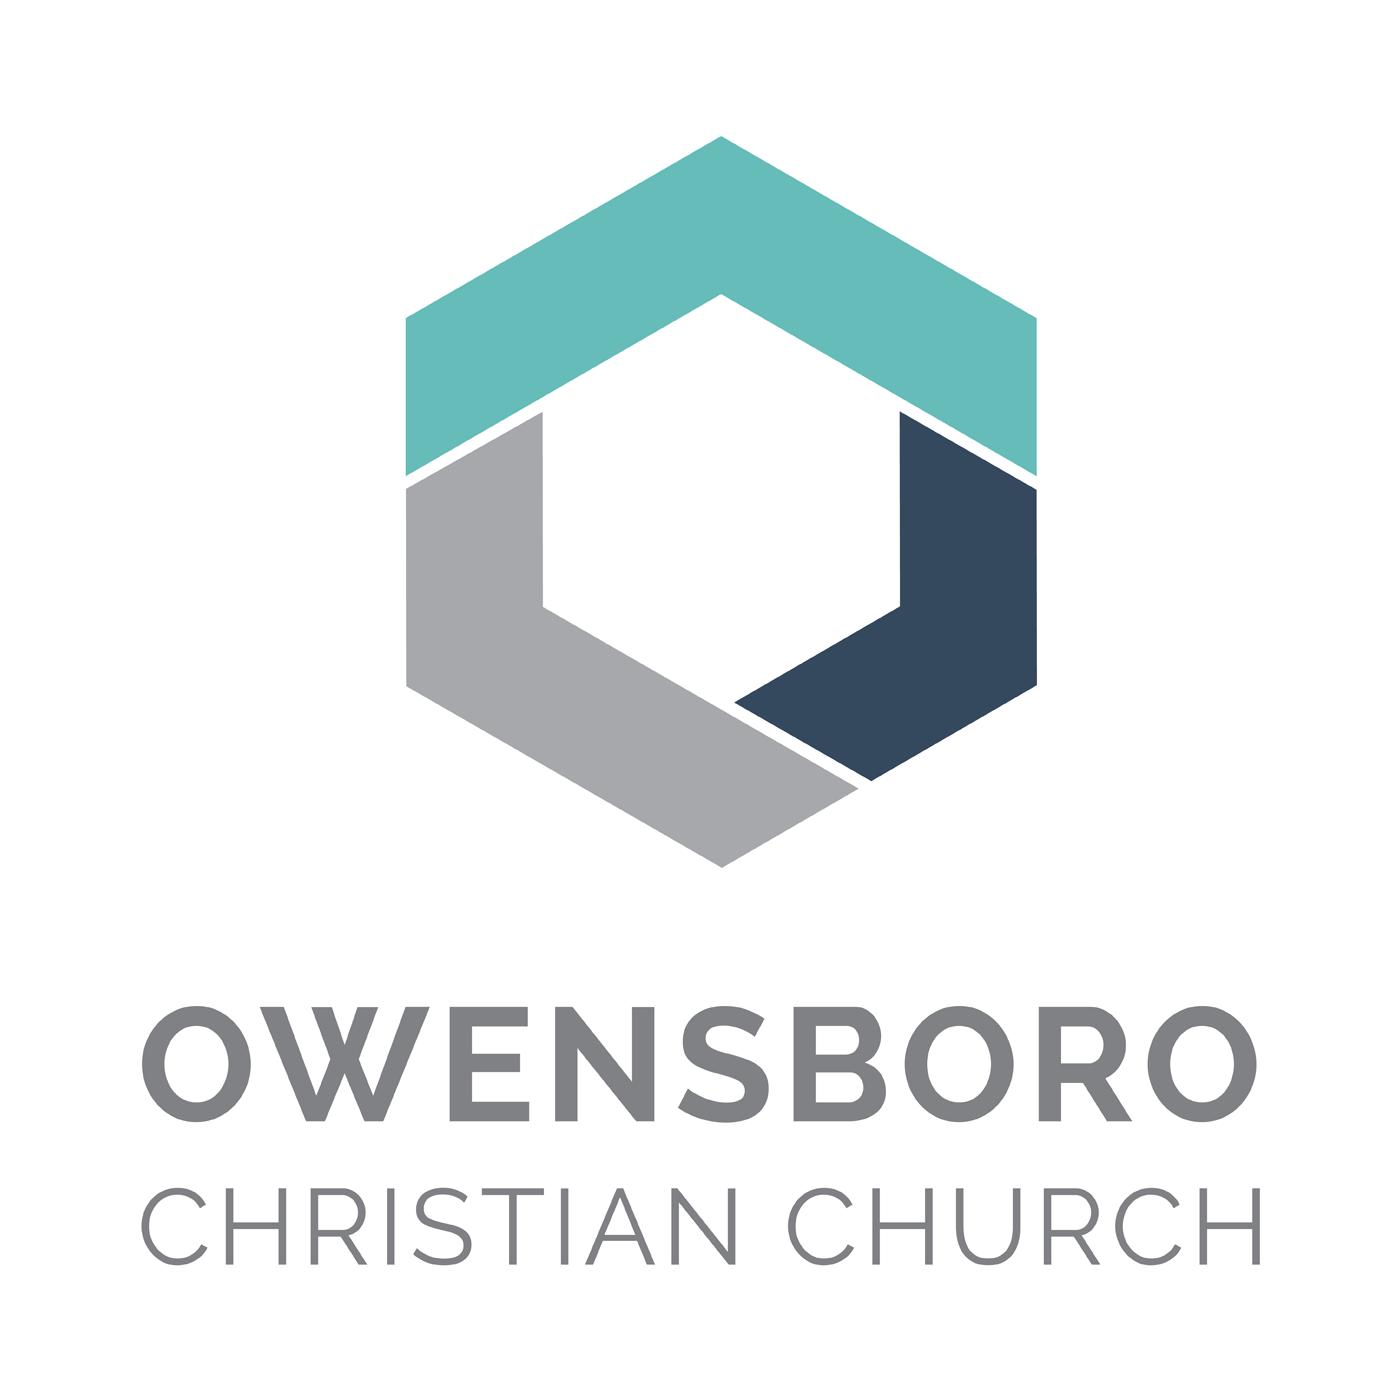 Owensboro Christian Church